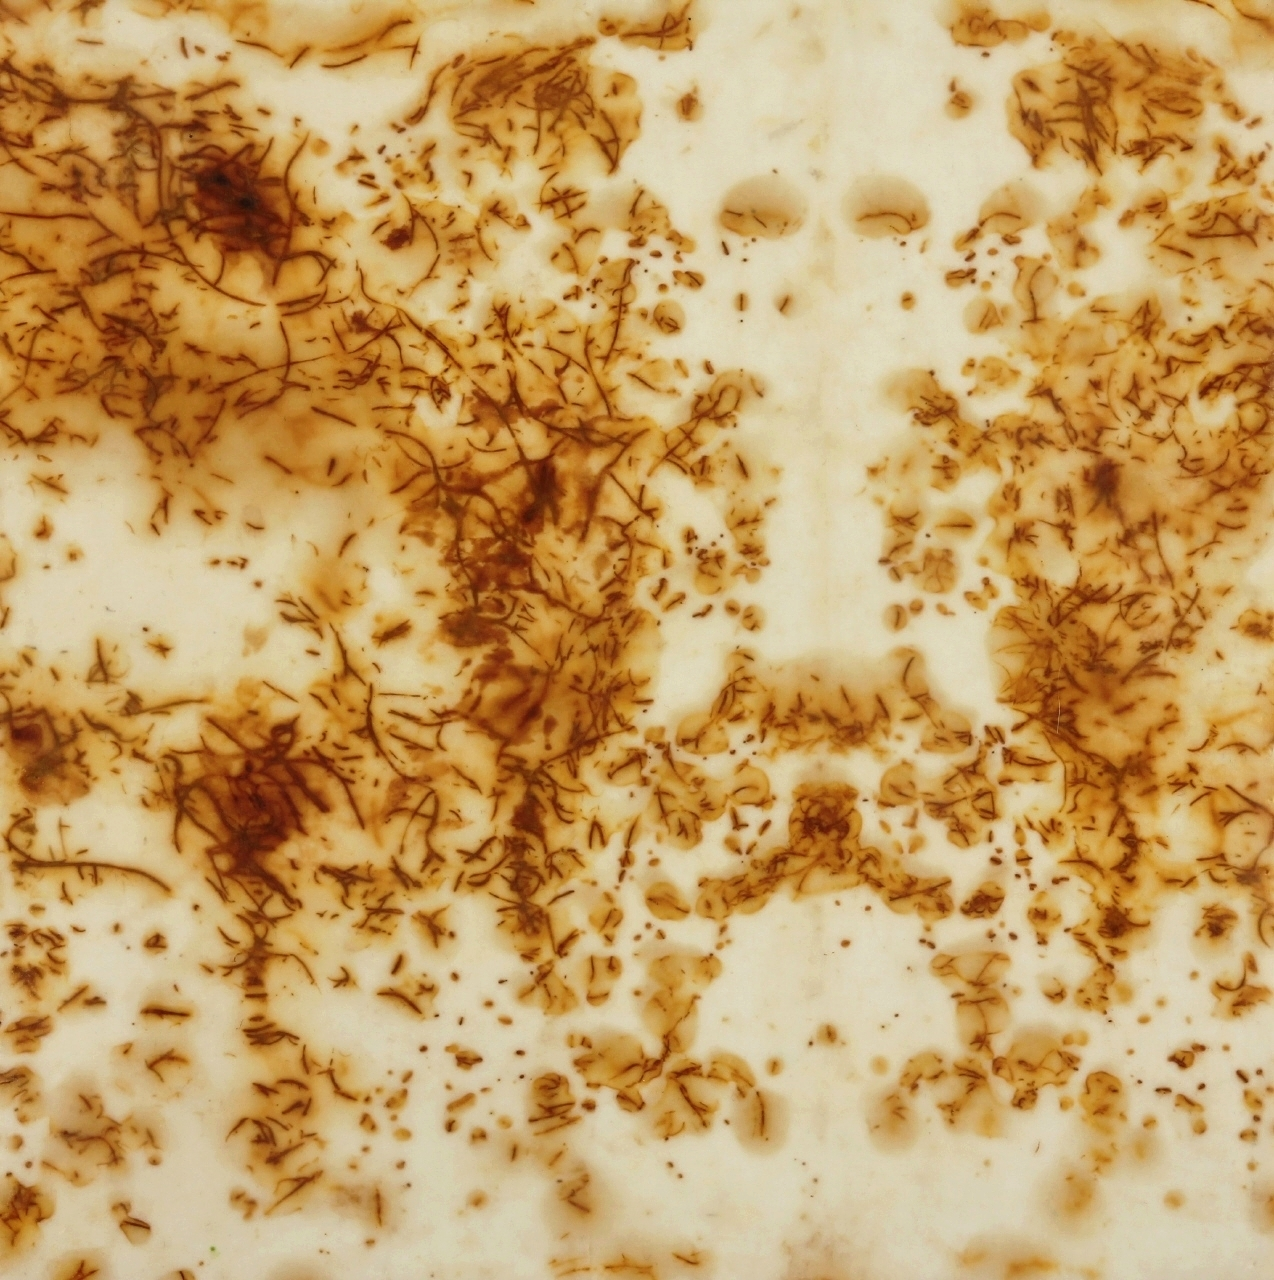 "Rust #28, 2013, Rust, encaustic on paper on panel, 12 x 12"""